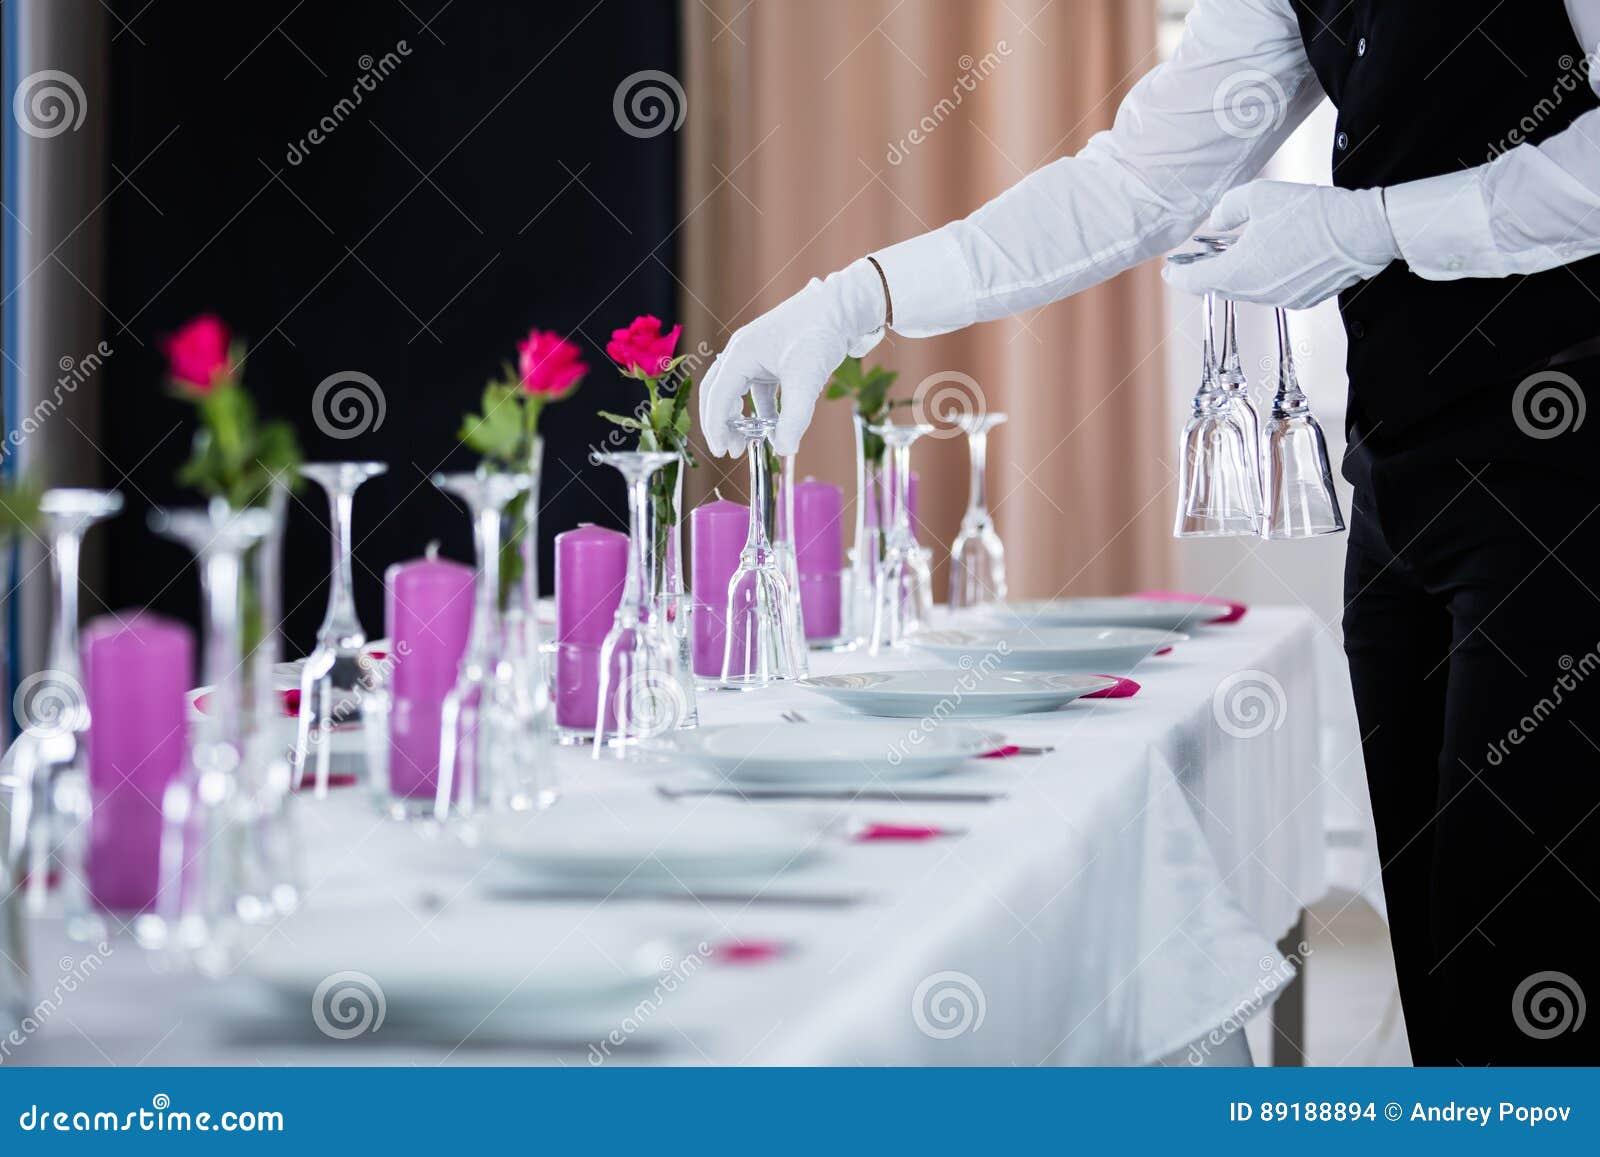 Garçom Setting Wedding Table